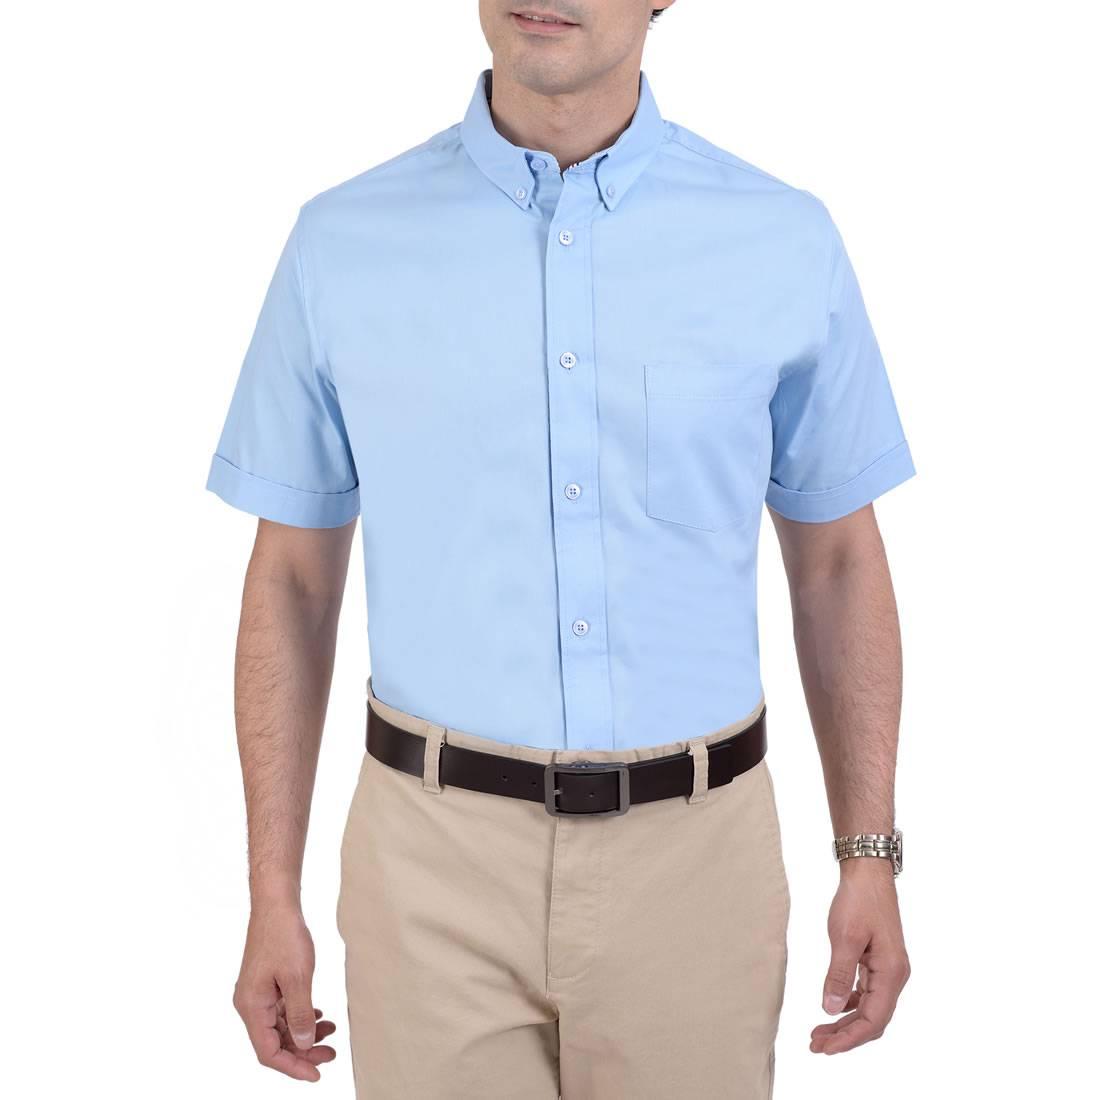 042331381711-01-Camisa-Manga-Corta-classic-Fit-Azul-Cielo-yale